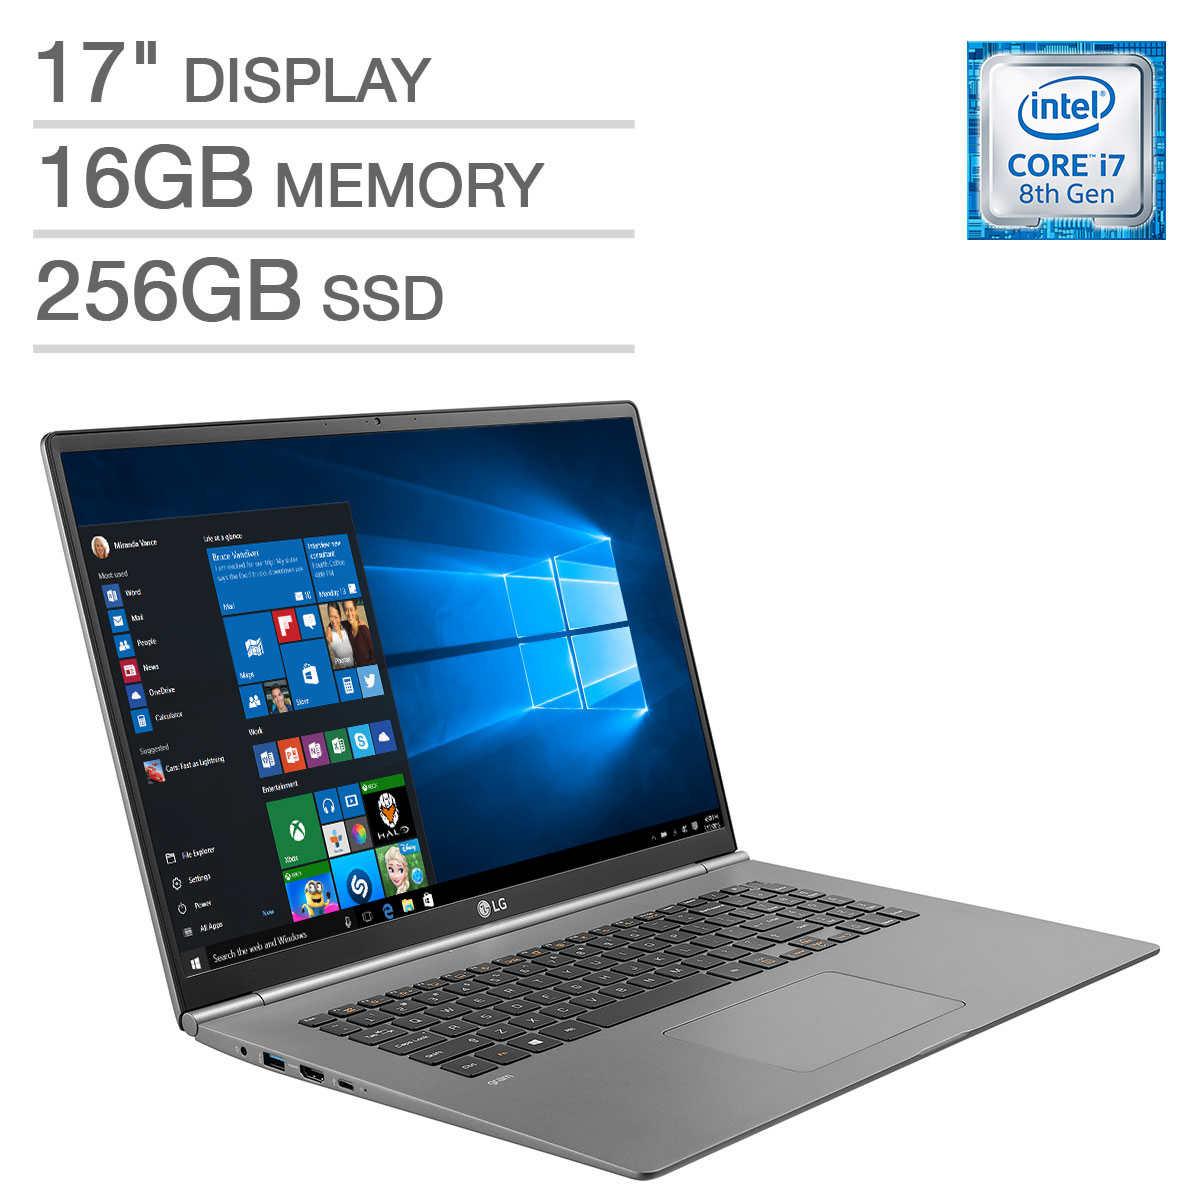 LG Gram 17 Laptop - Intel Core i7 - WQXGA (2560 x 1600) - Ultra Thin and  Light at 2 95lbs